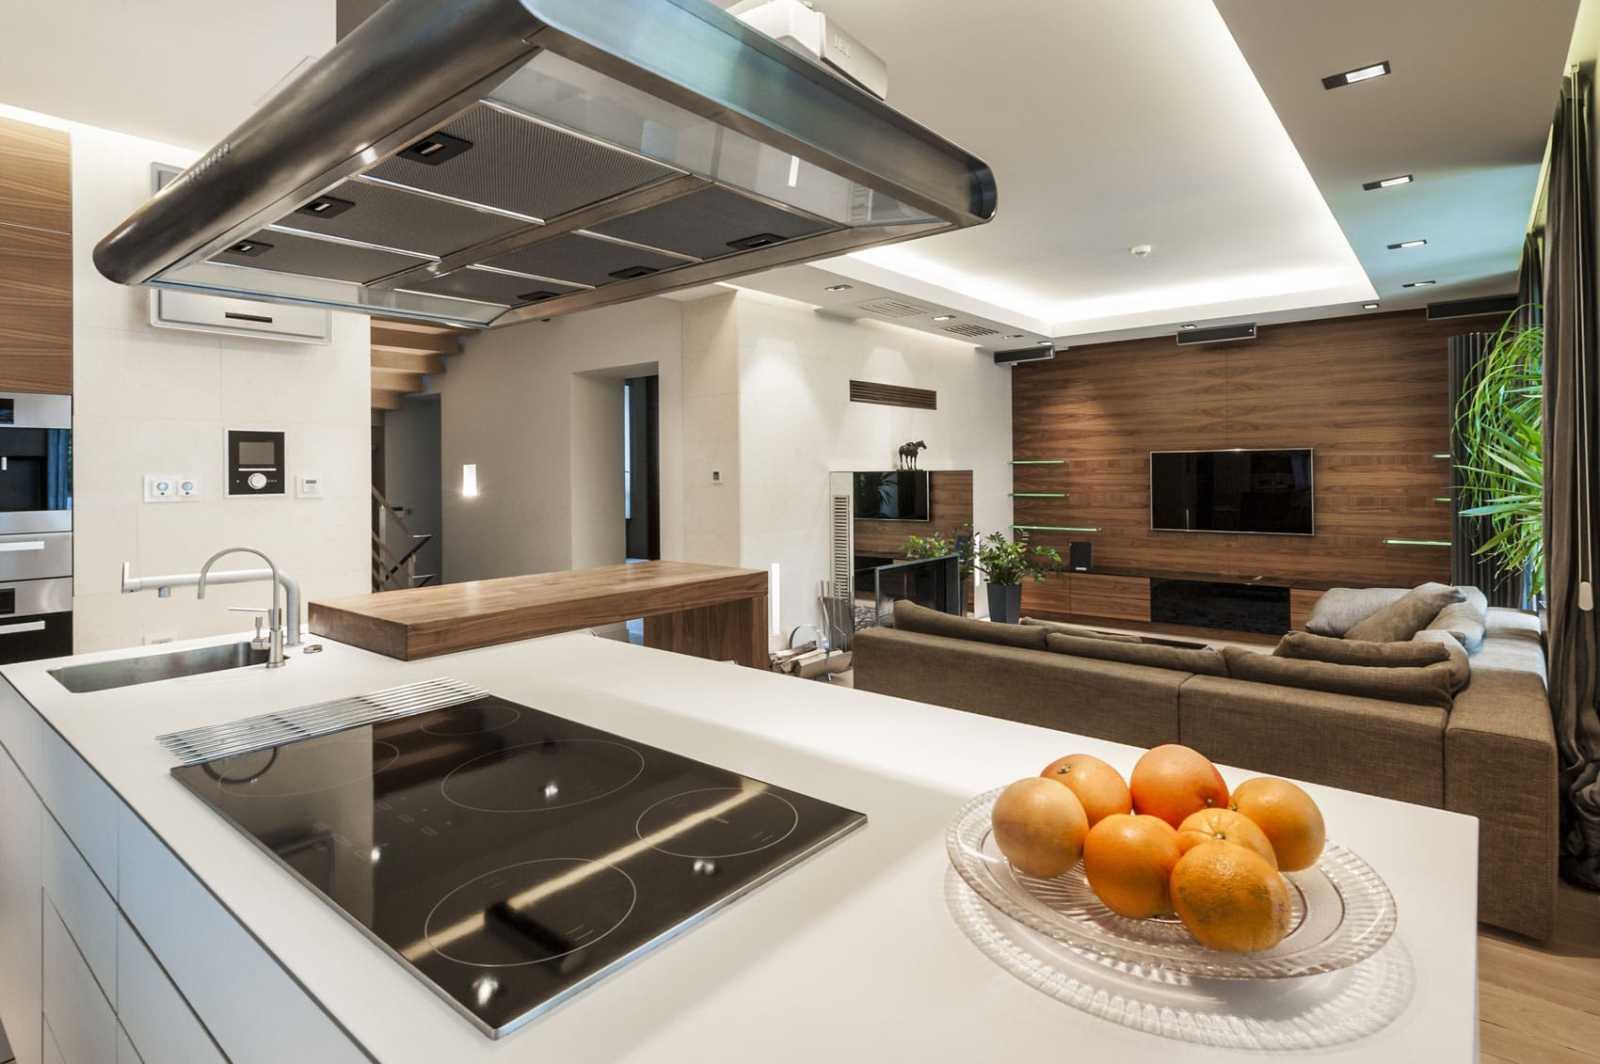 10 tendencias en cocinas para 2019